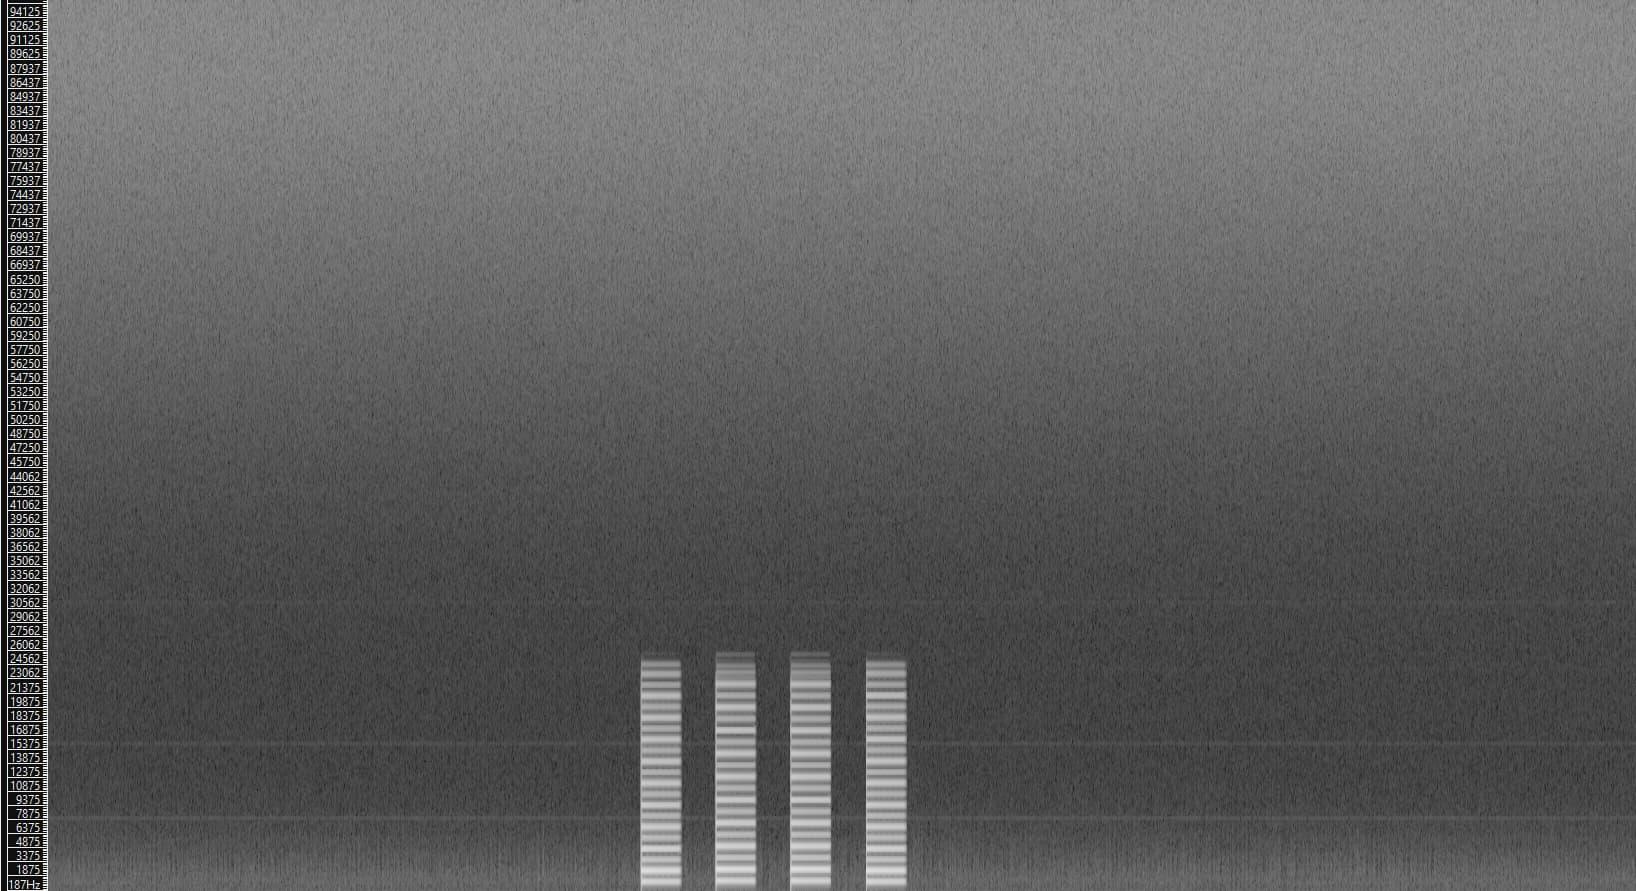 192khz with HF noise